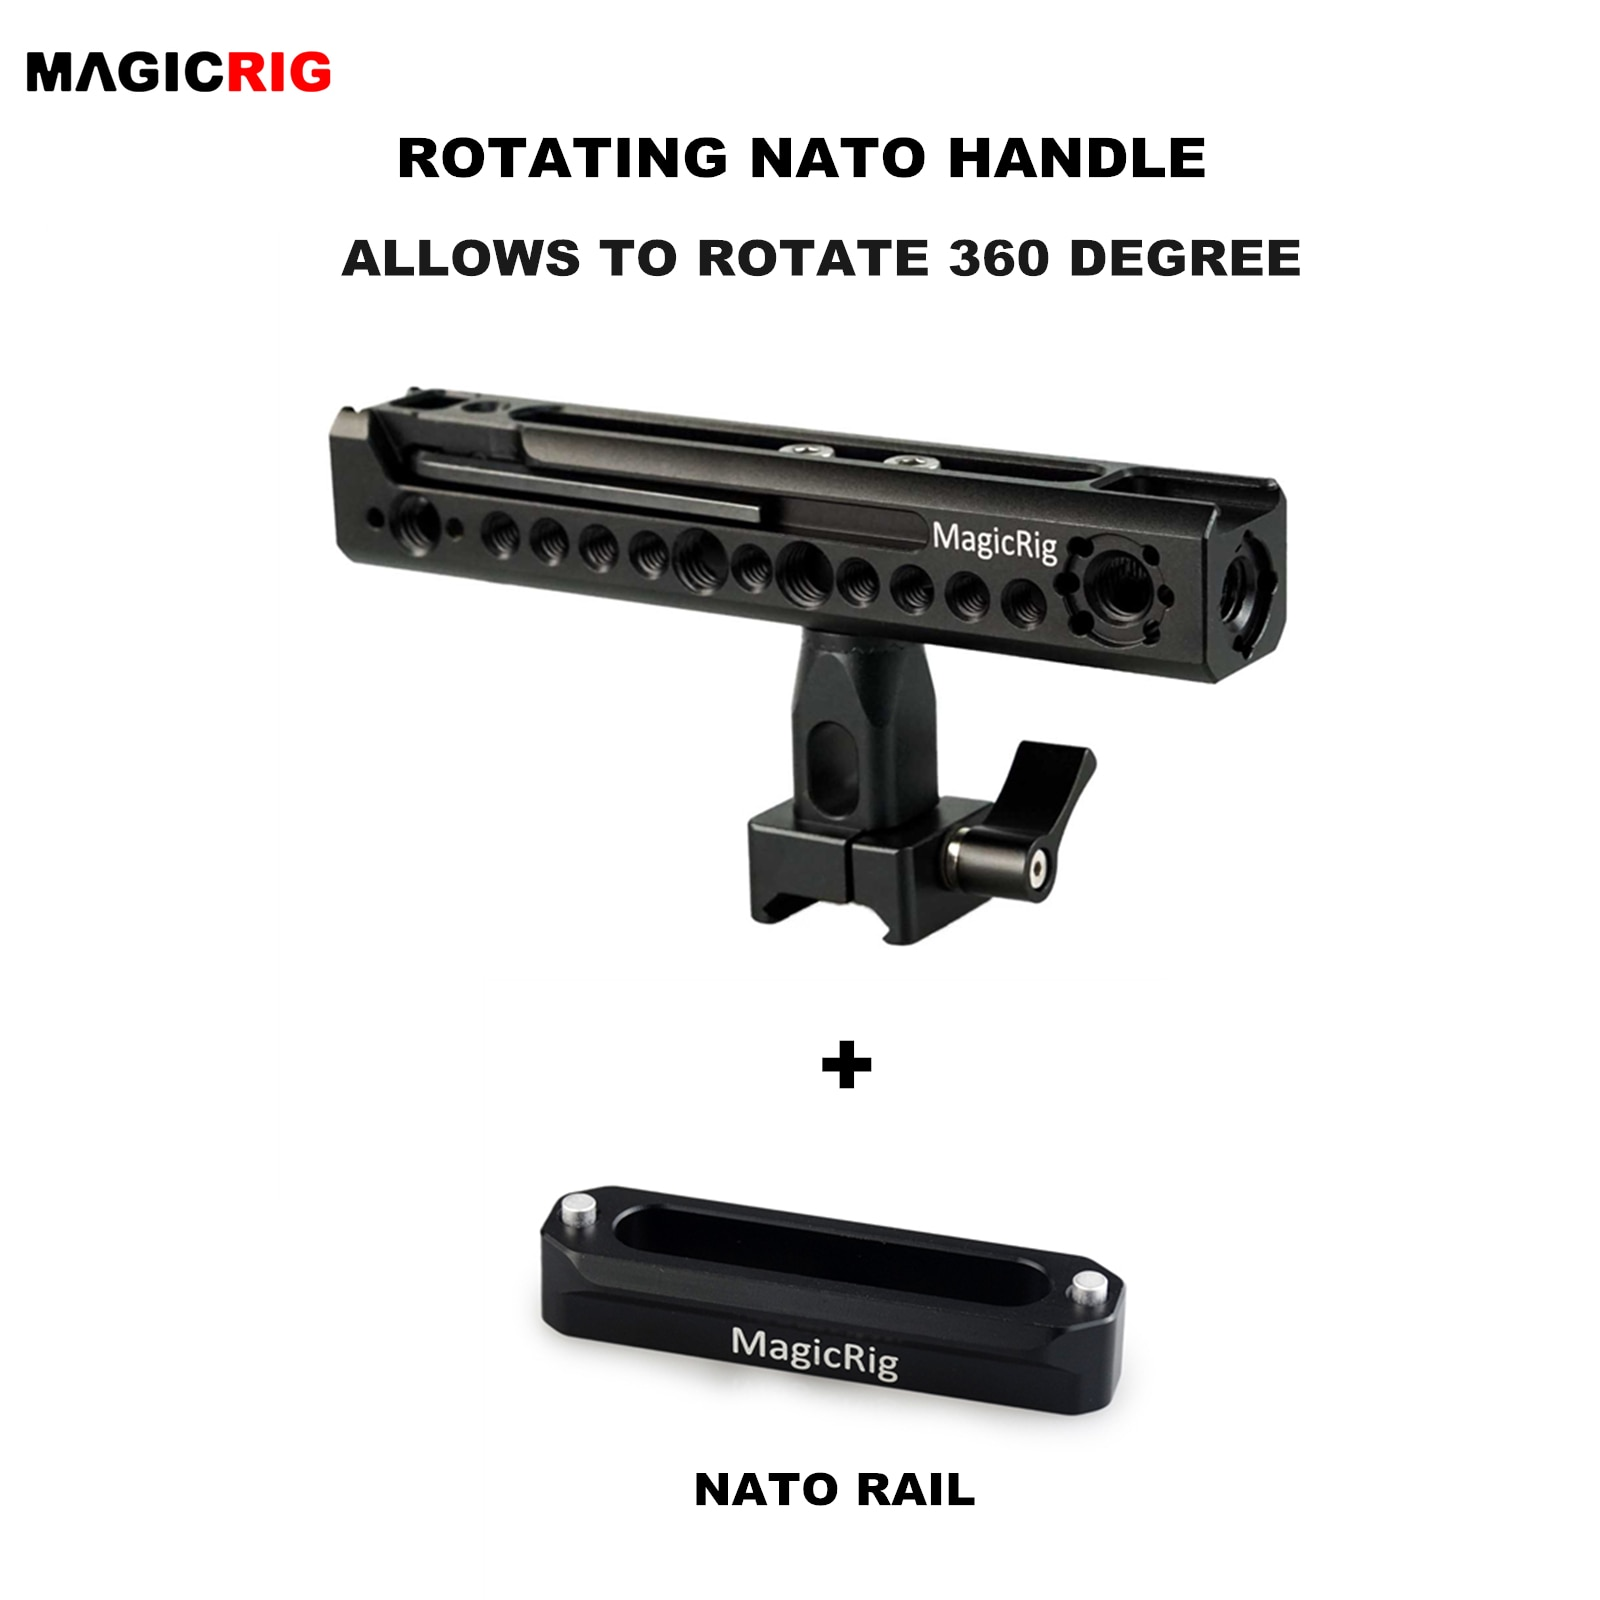 MAGICRIG-مقبض دوار بمقبض ناتو ، مع حامل حذاء بارد ونقطة تحديد موقع لكاميرا DSLR ، قفص كاميرا